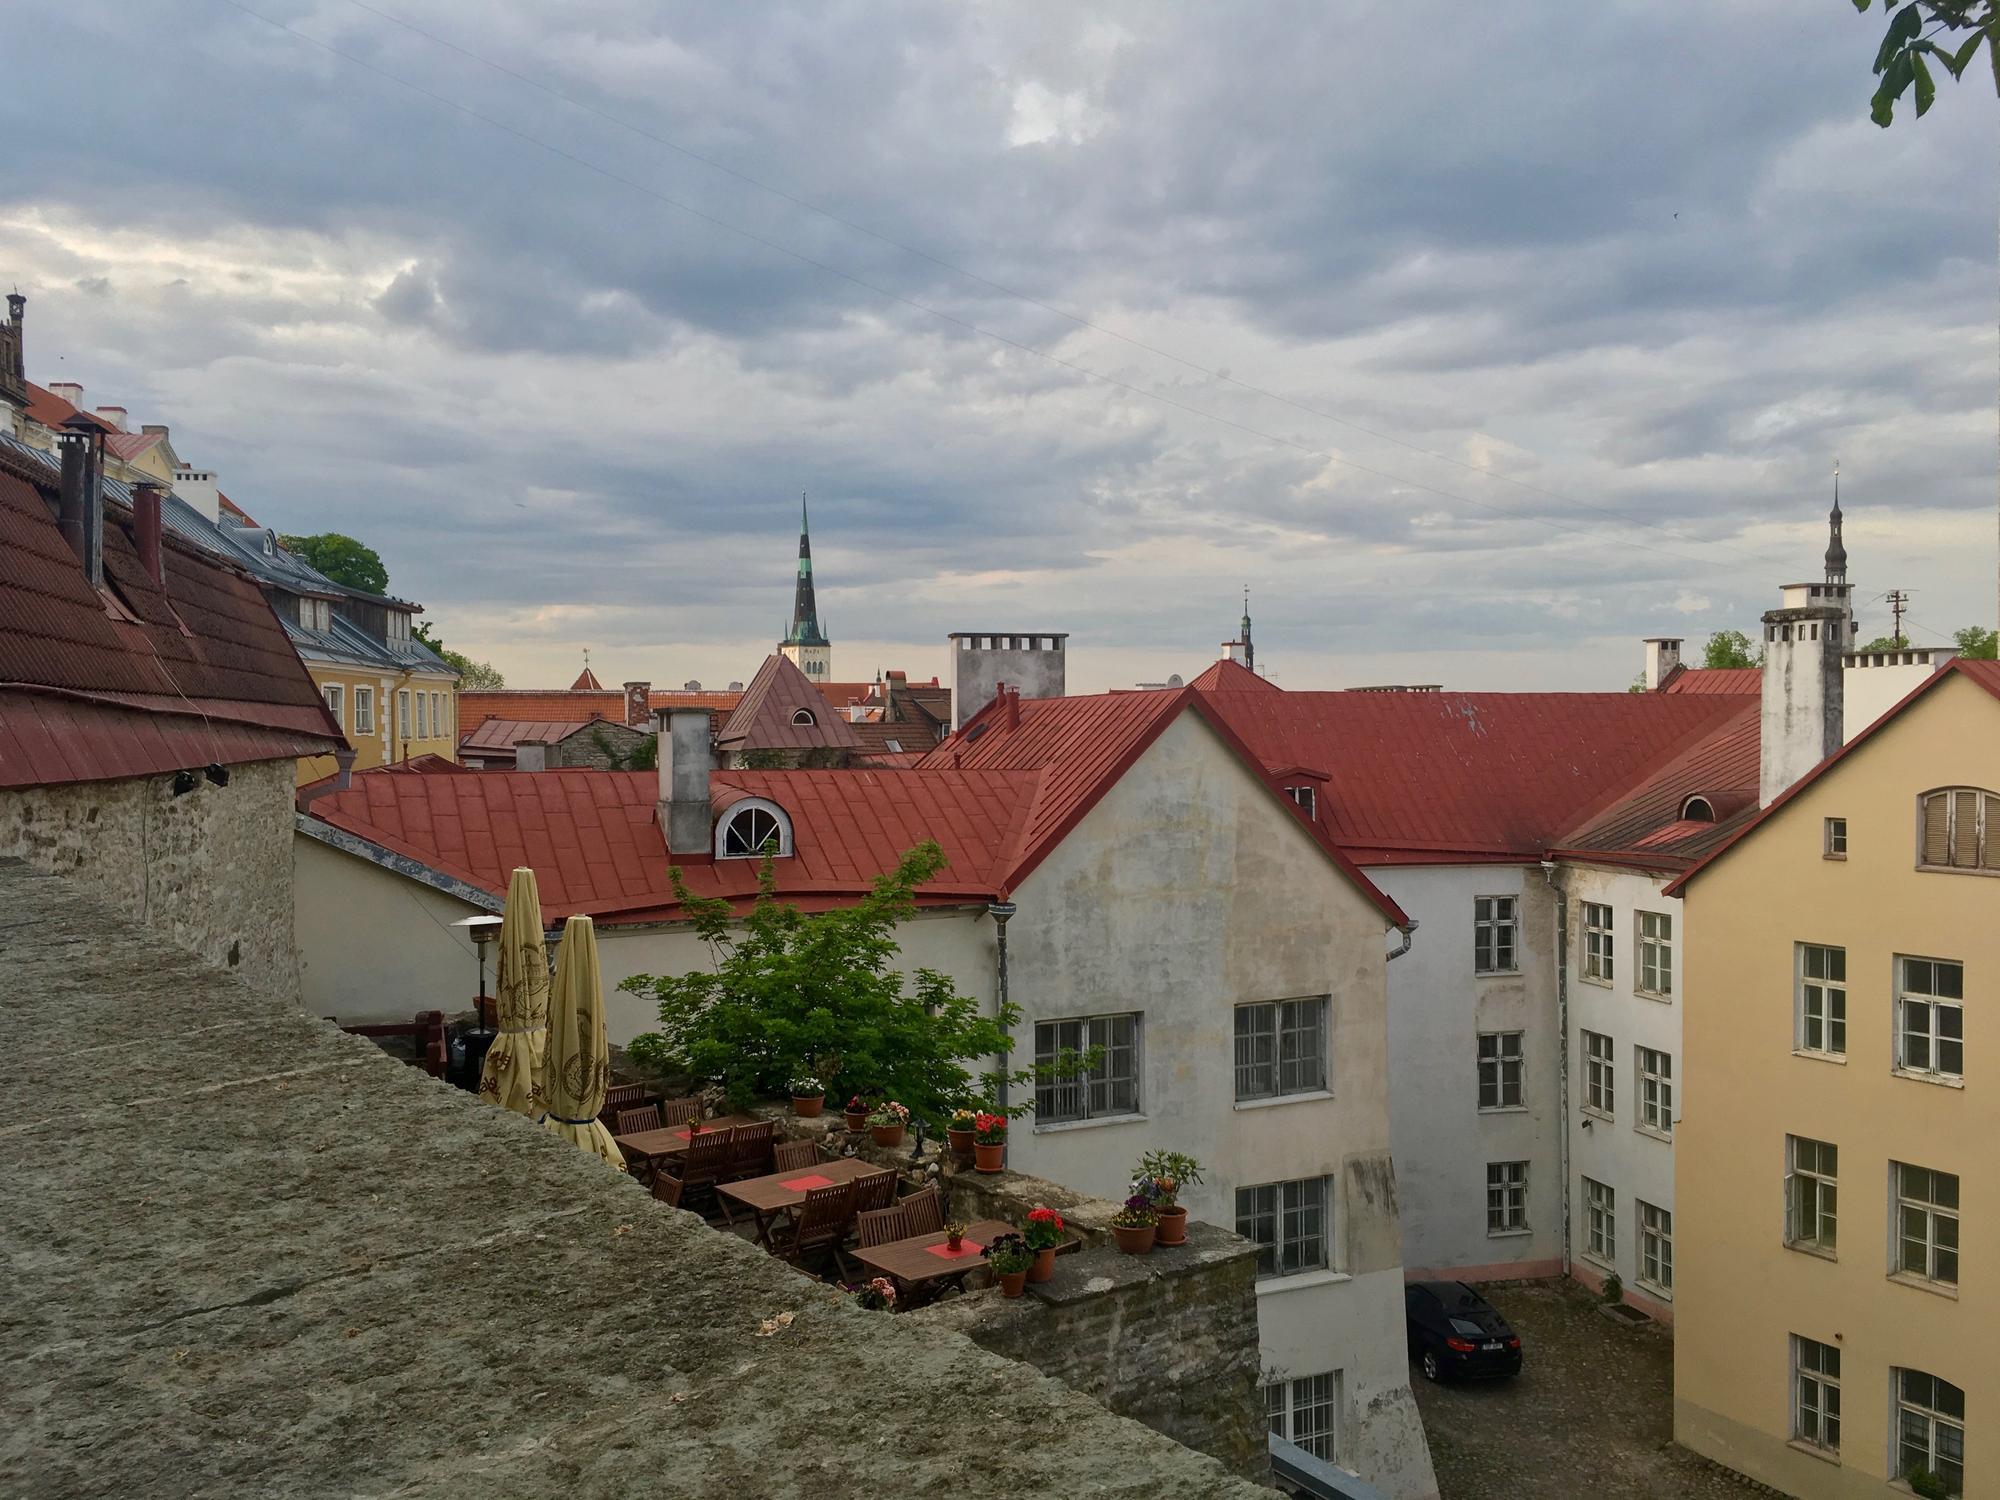 🇪🇪 Таллинн, Эстония, май 2018.